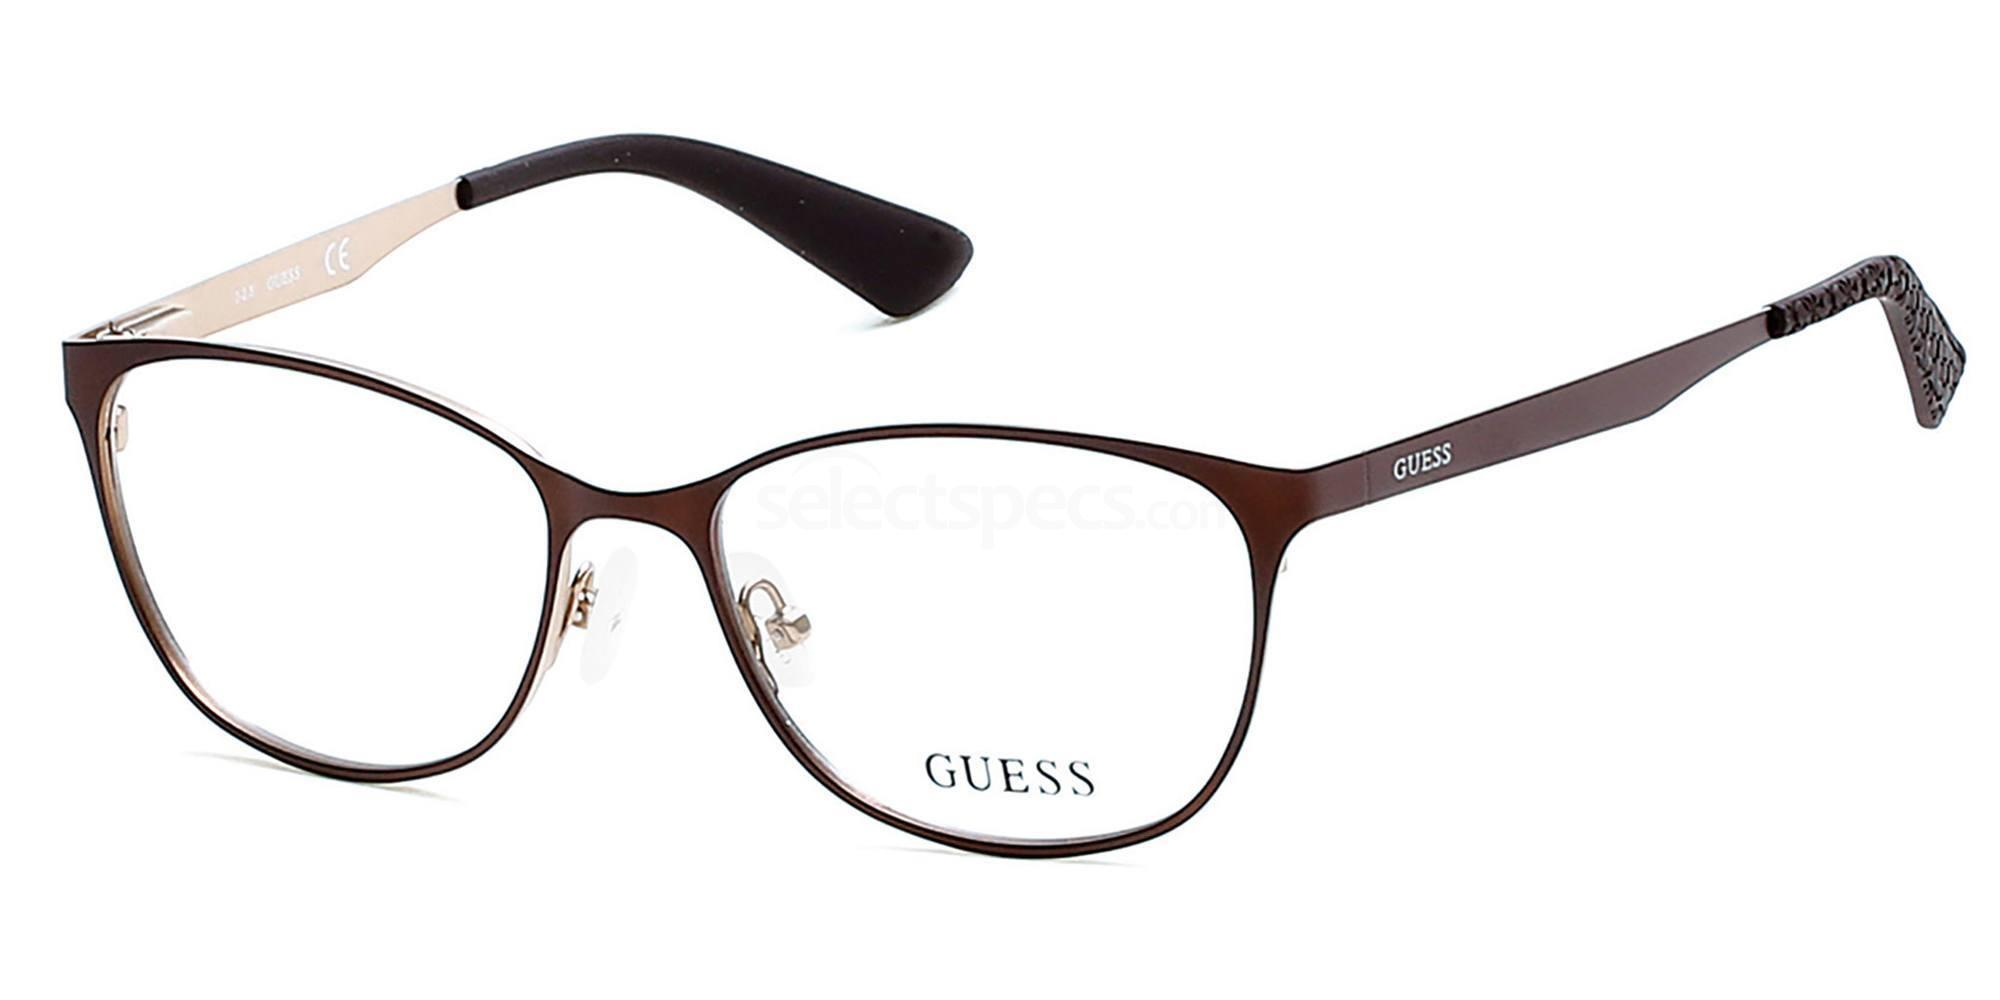 049 GU2564 Glasses, Guess